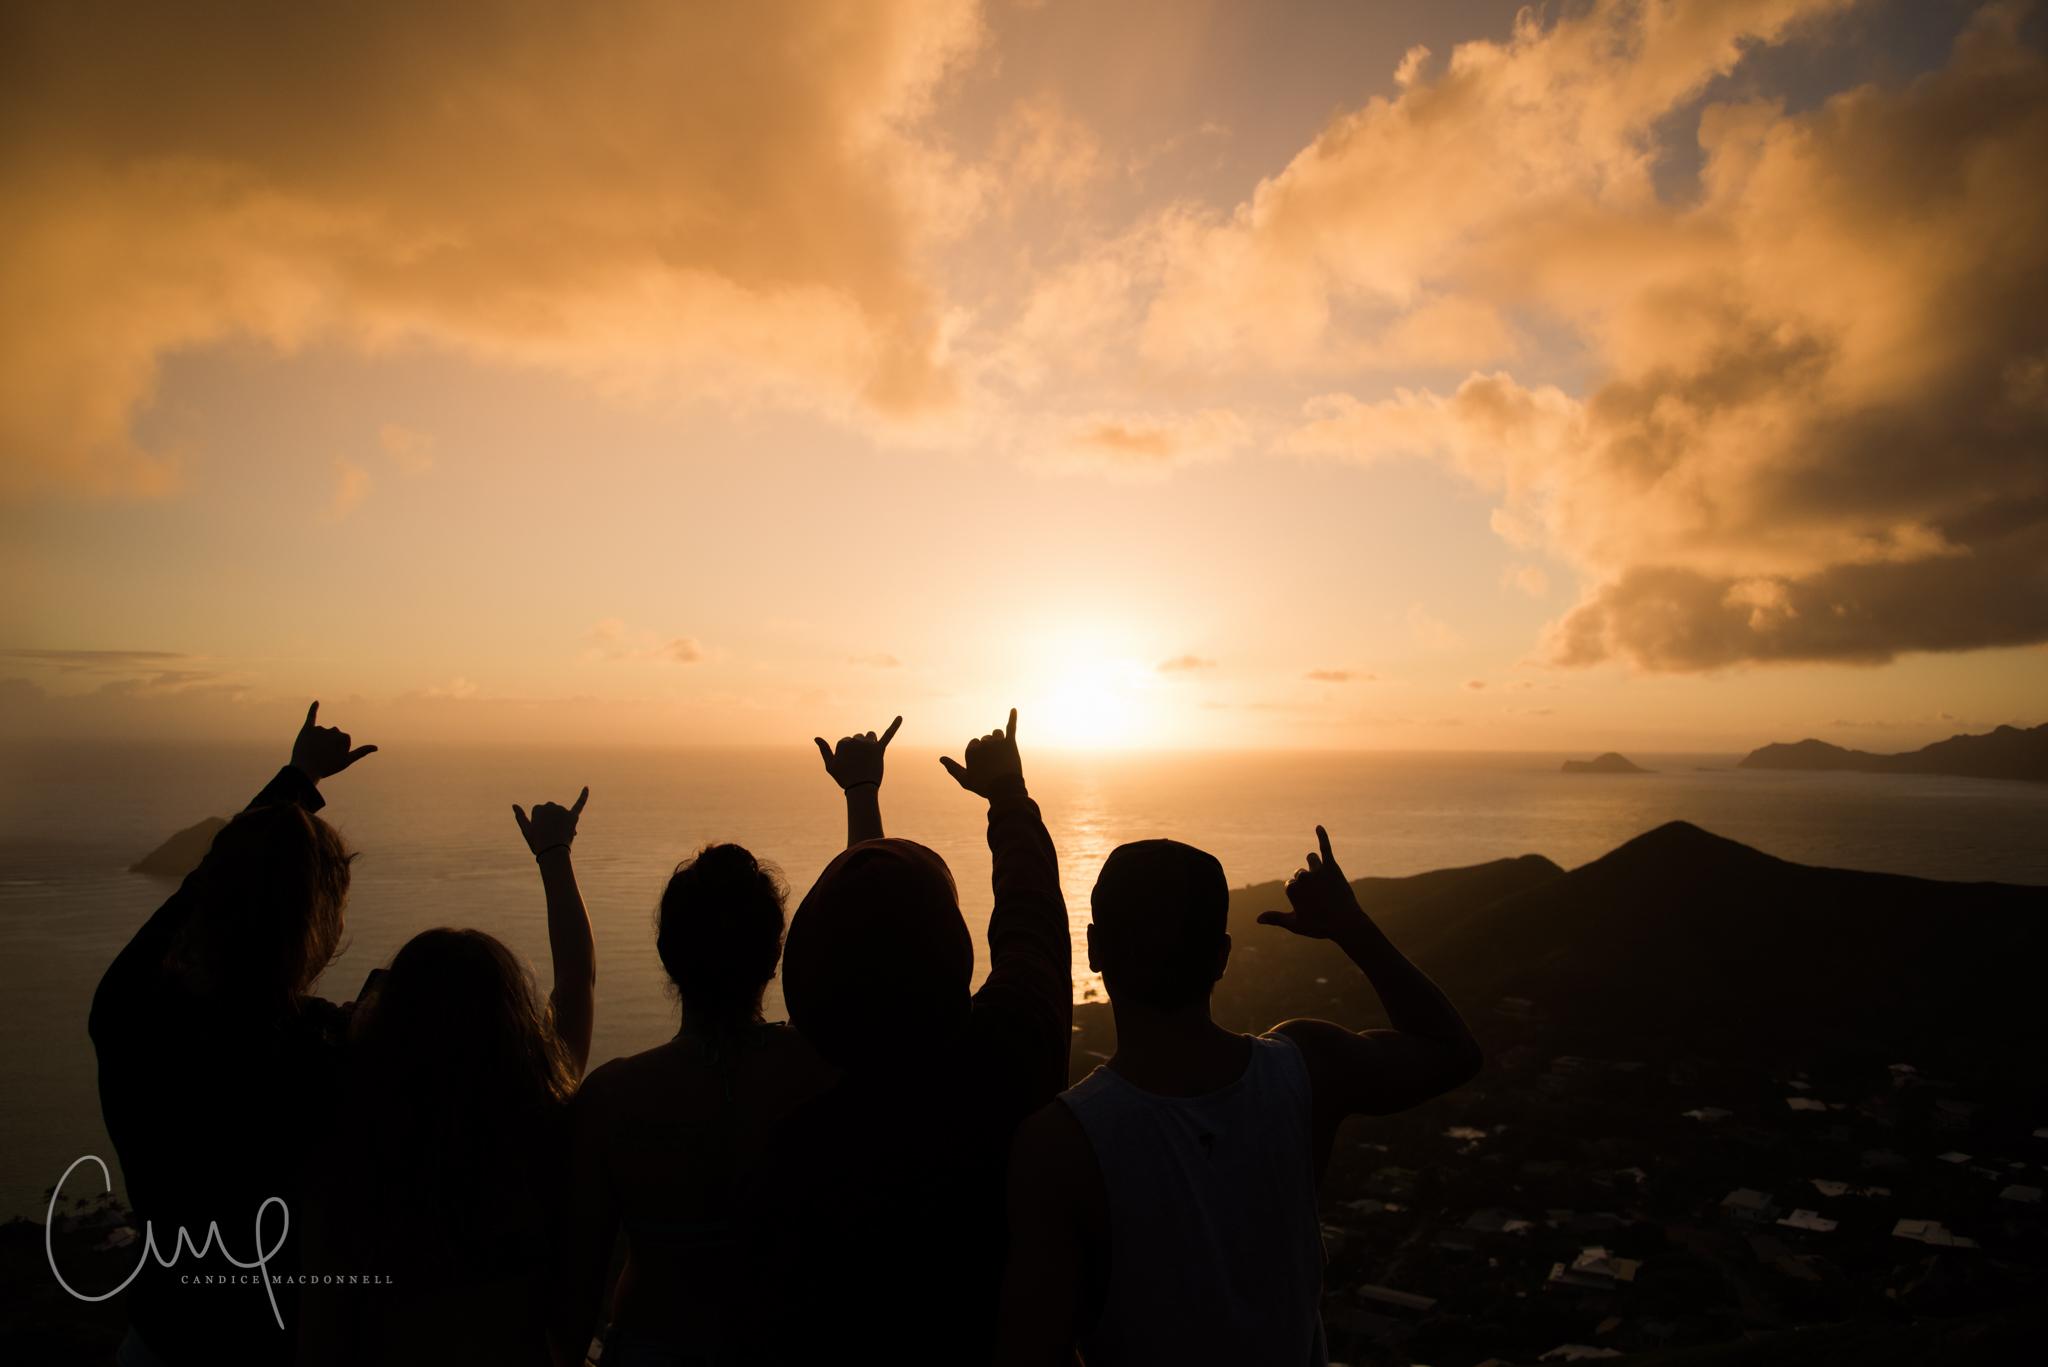 shaka aloha sillohette lanikai pillboxes oahu hawaii